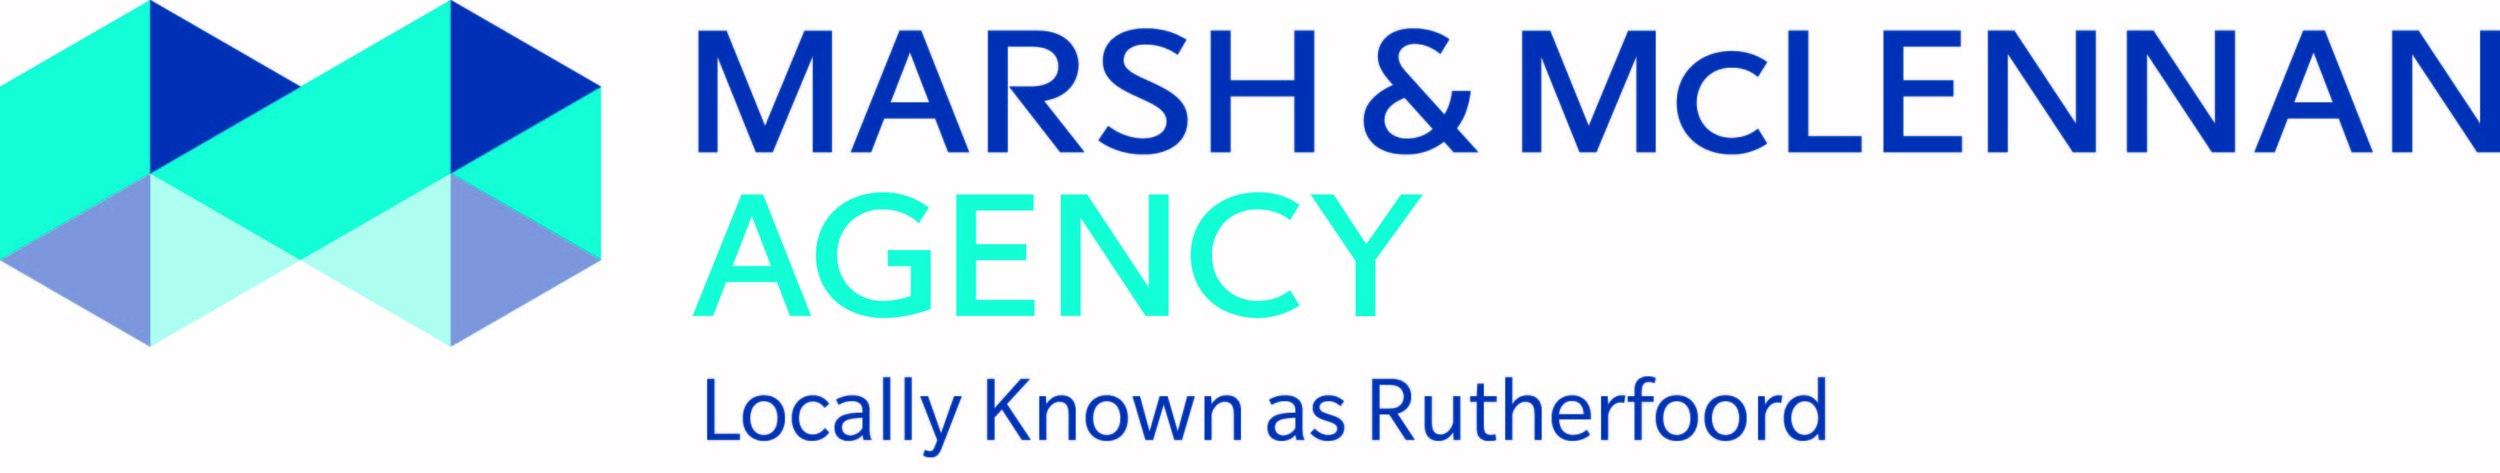 marsh & mclennan insurance agency logo